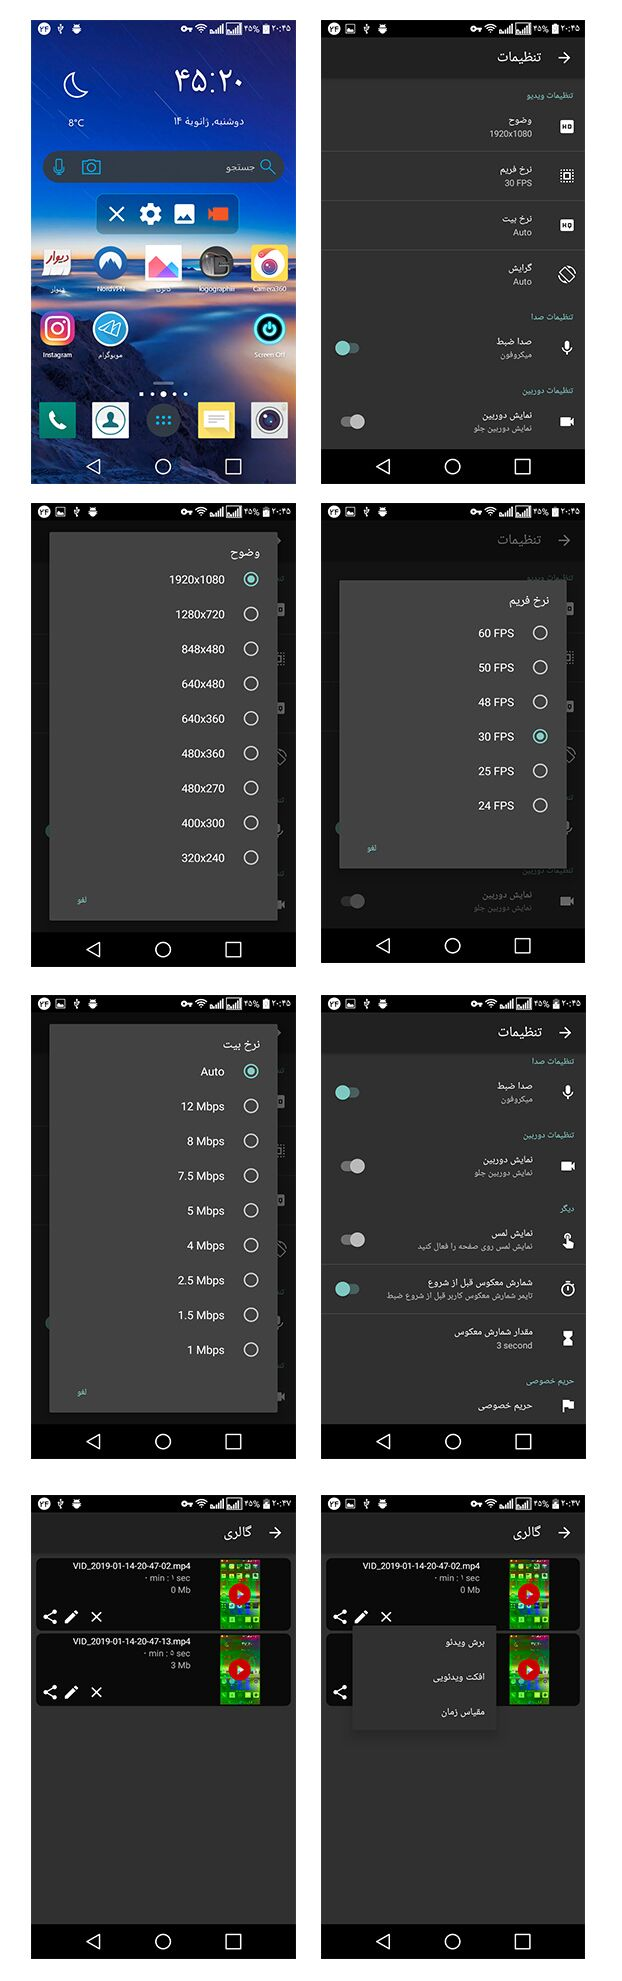 IiVUifVy - سورس اندروید اپلیکیشن فیلم برداری از صفحه